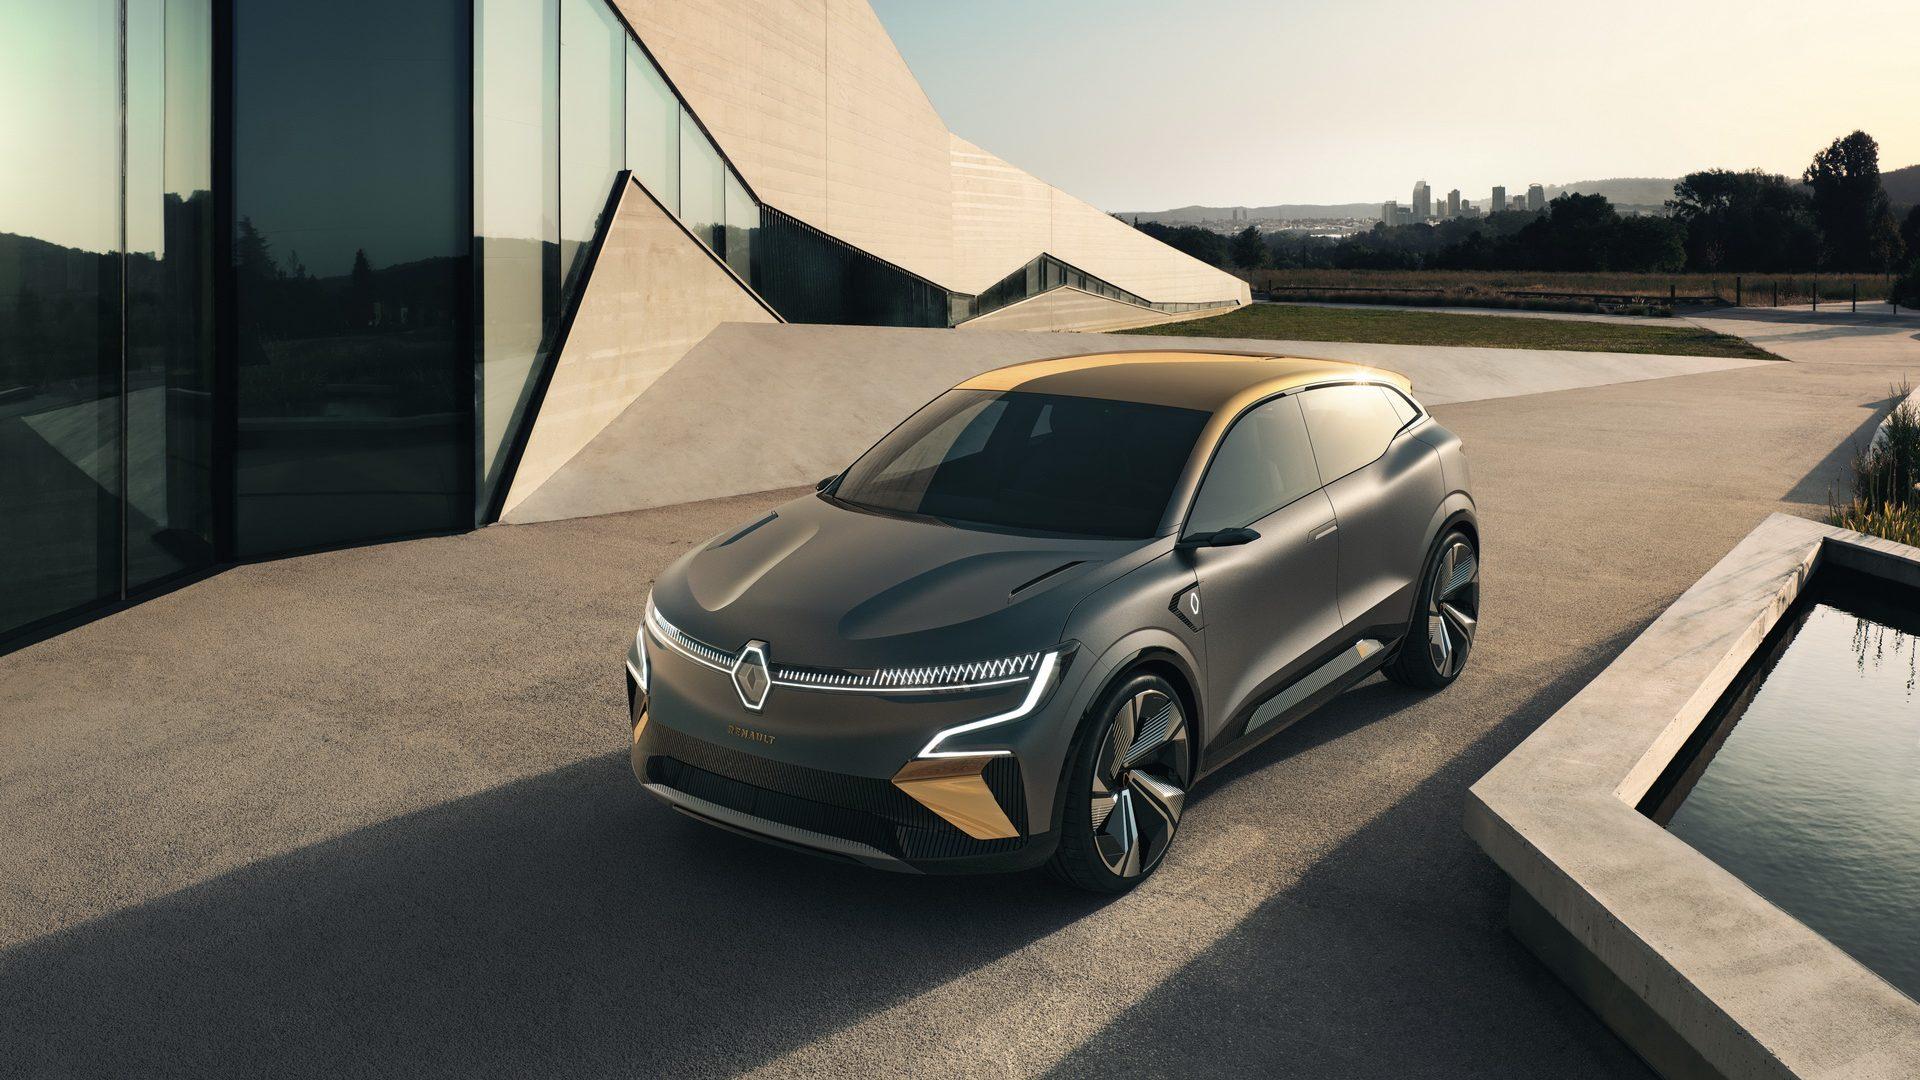 2020-Renault-Megane-eVision-Concept-07